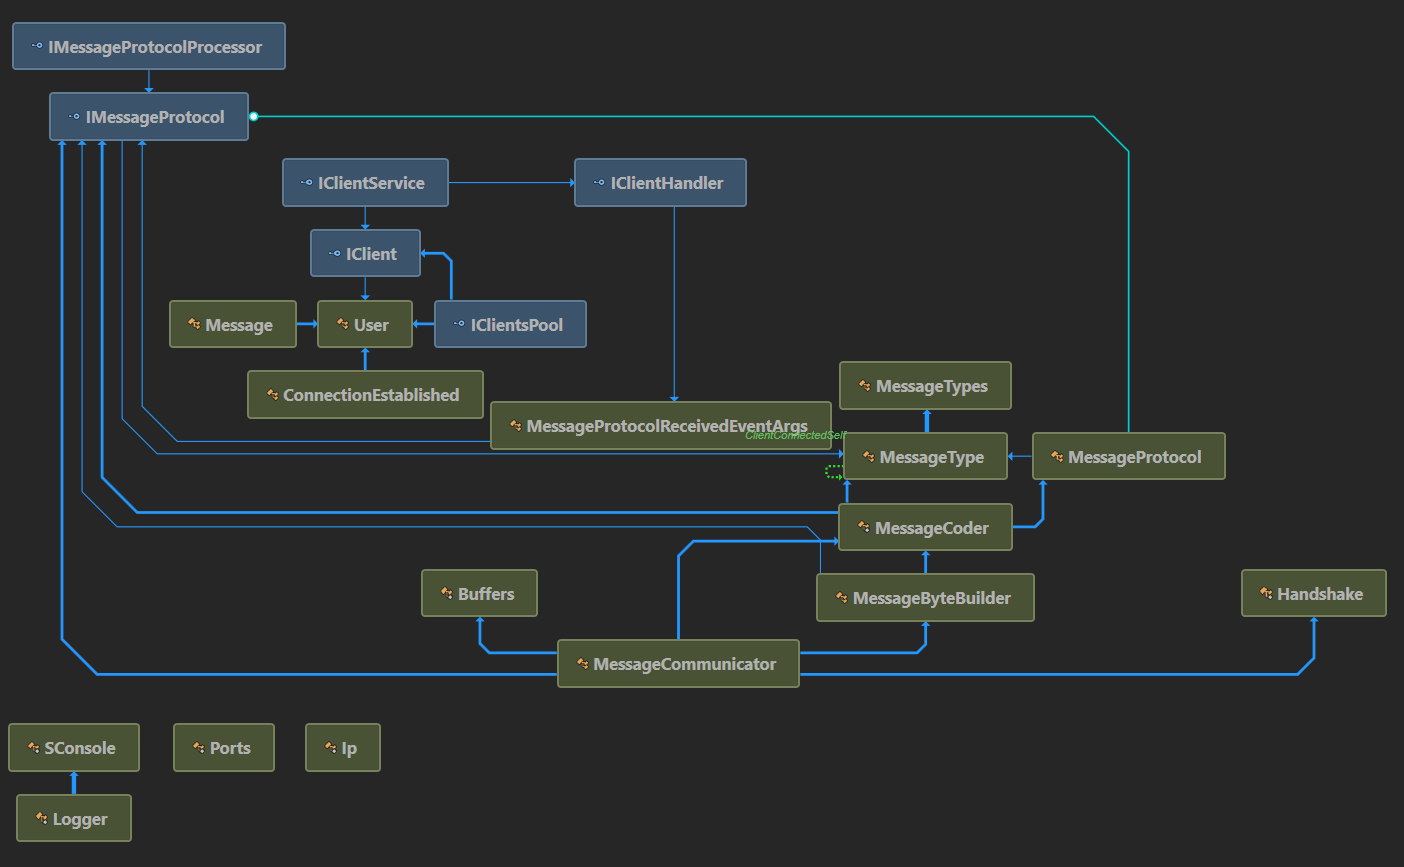 Github Andreilucaci Meseme Messenger App Logic Diagram Application Business Diag2